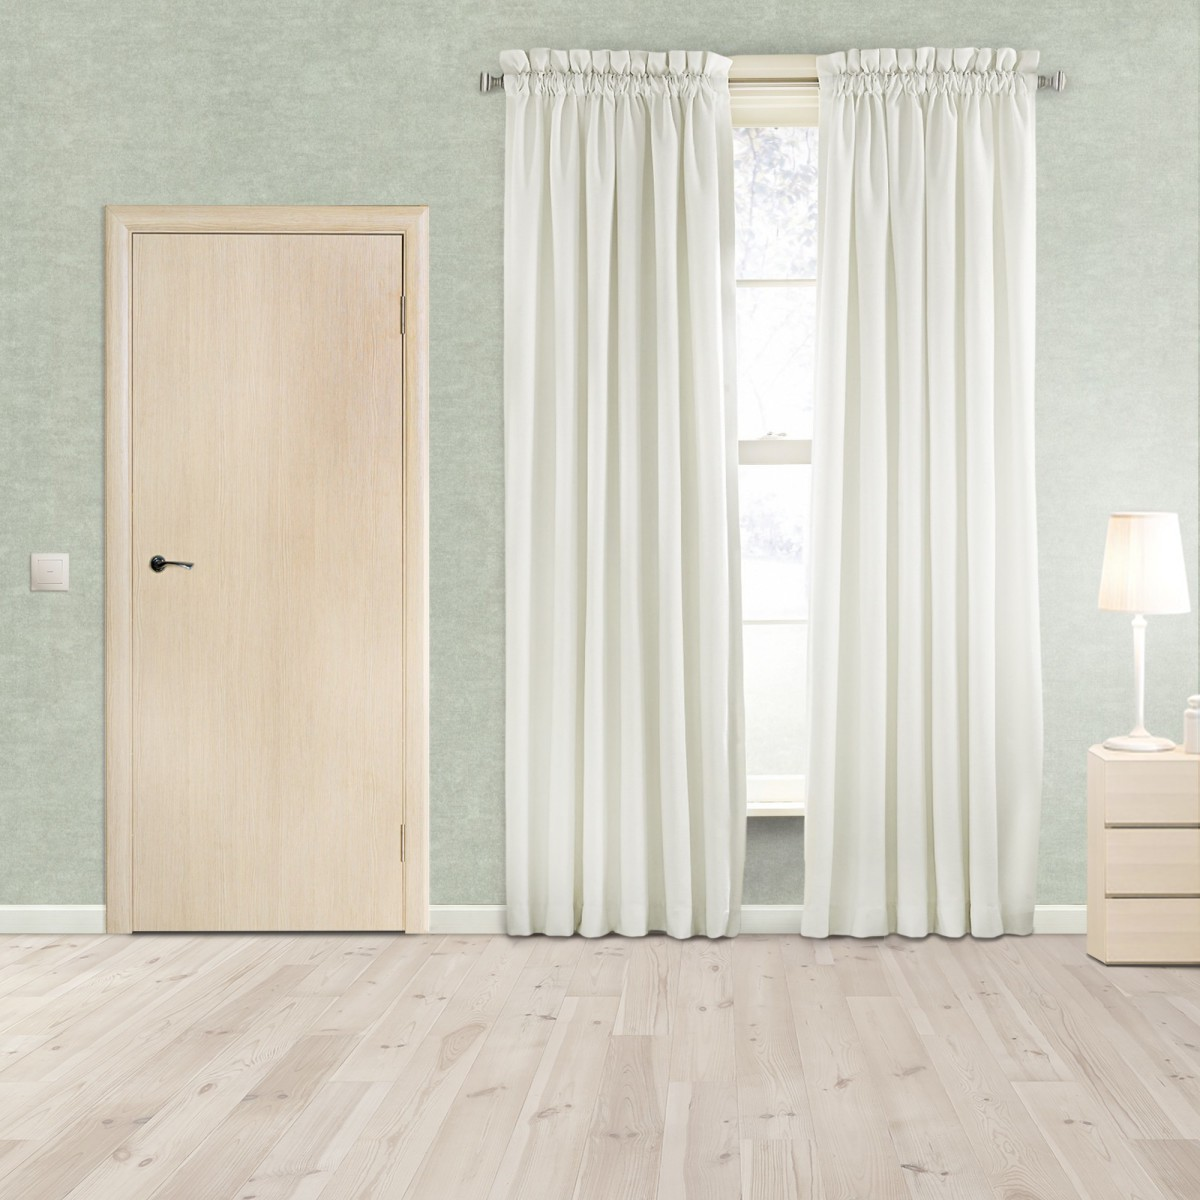 Дверь Межкомнатная Глухая Аура 70x200 Ламинация Цвет Ясень 3d